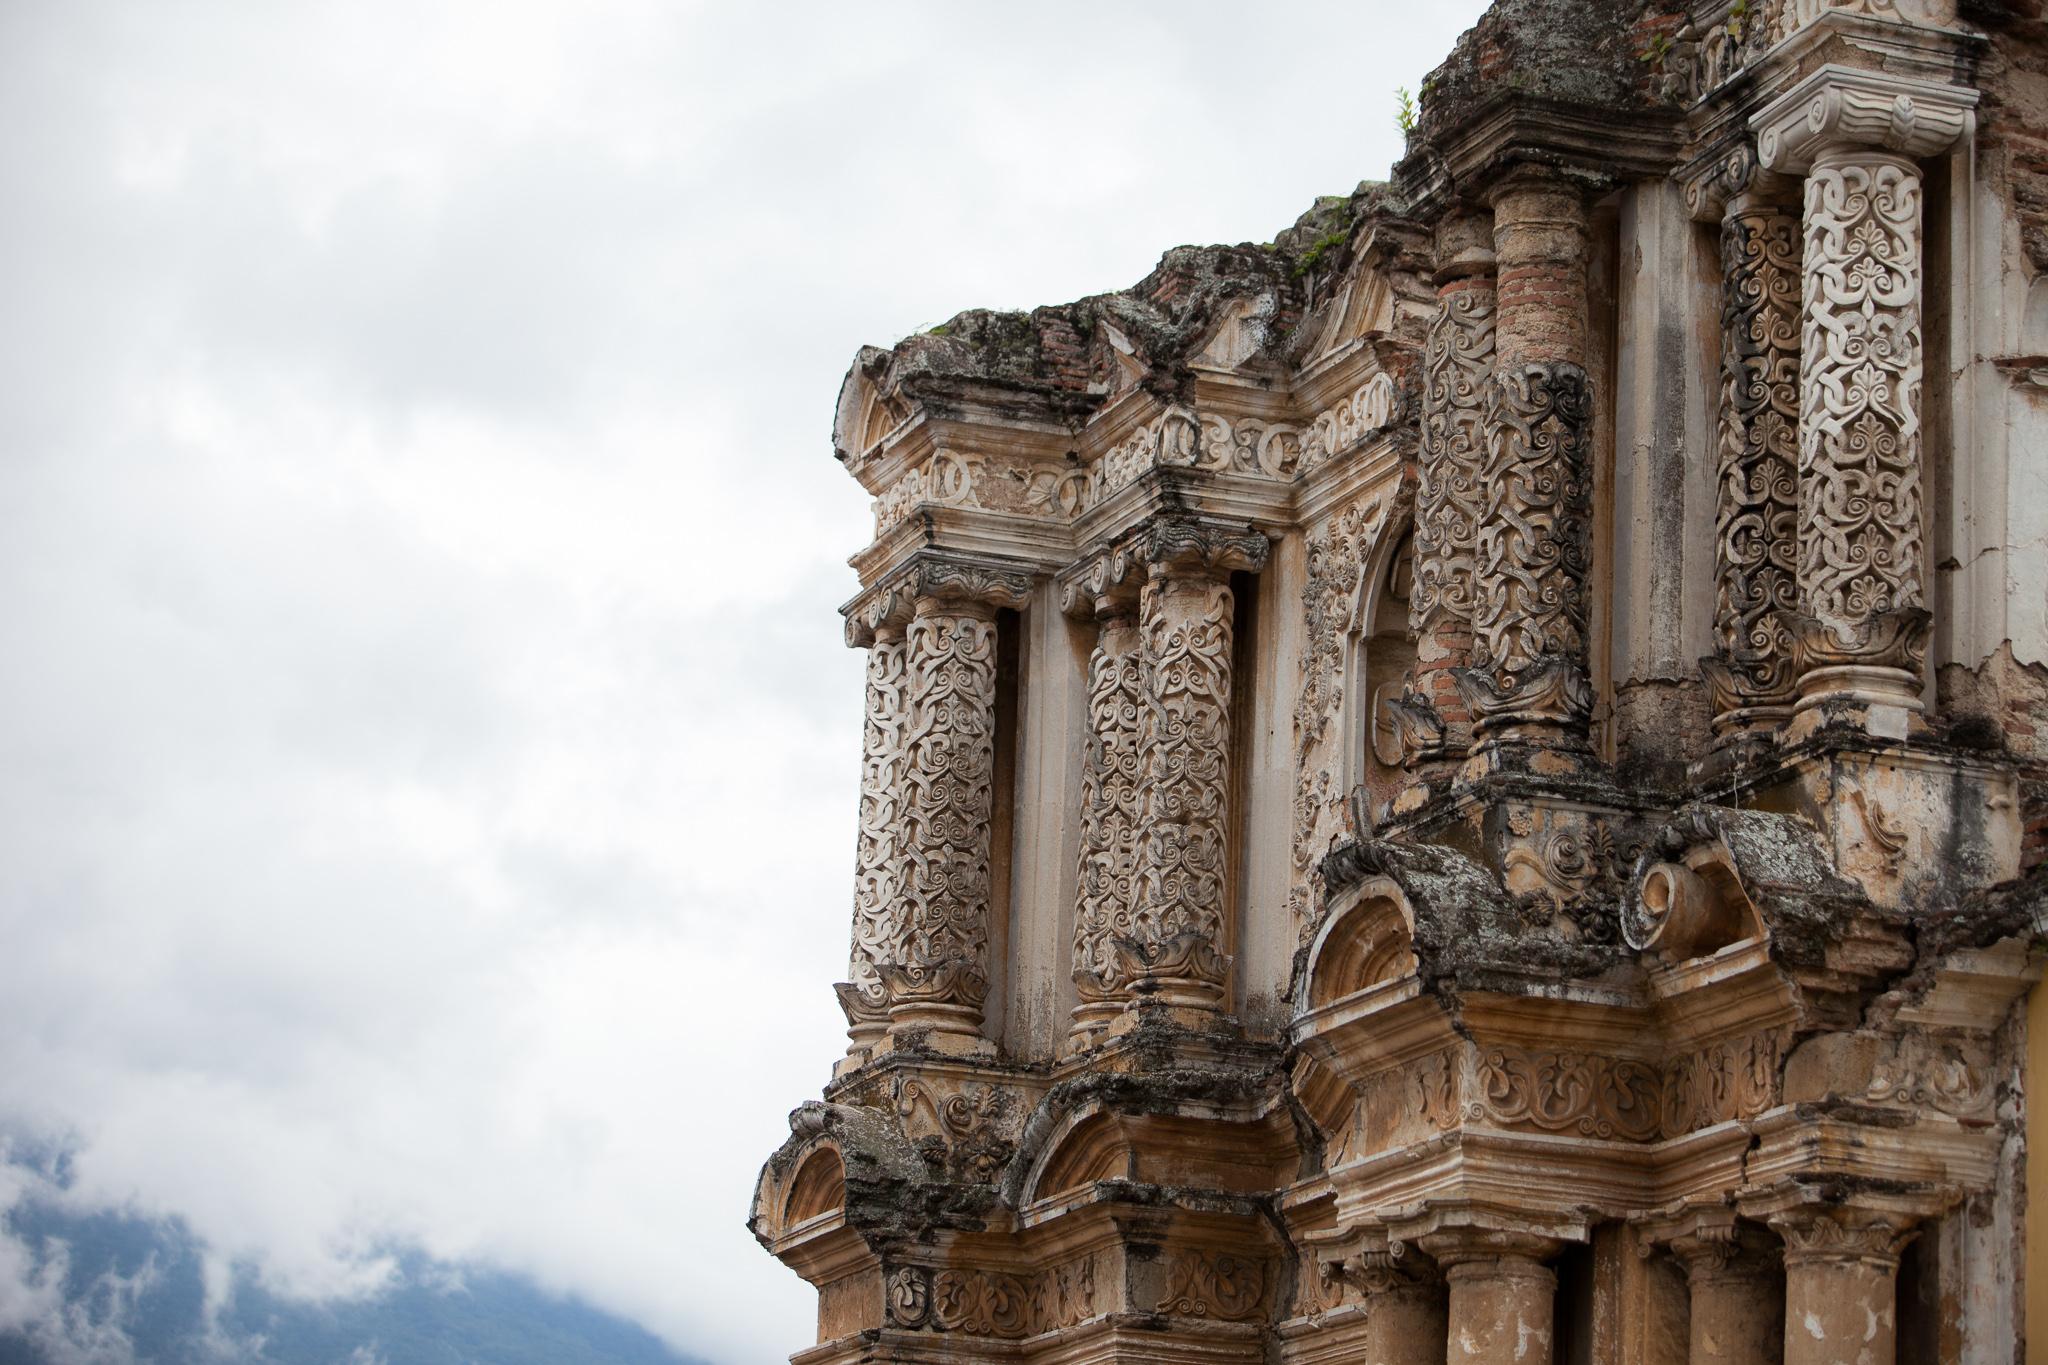 Guatemala-CP-160804-048.jpg